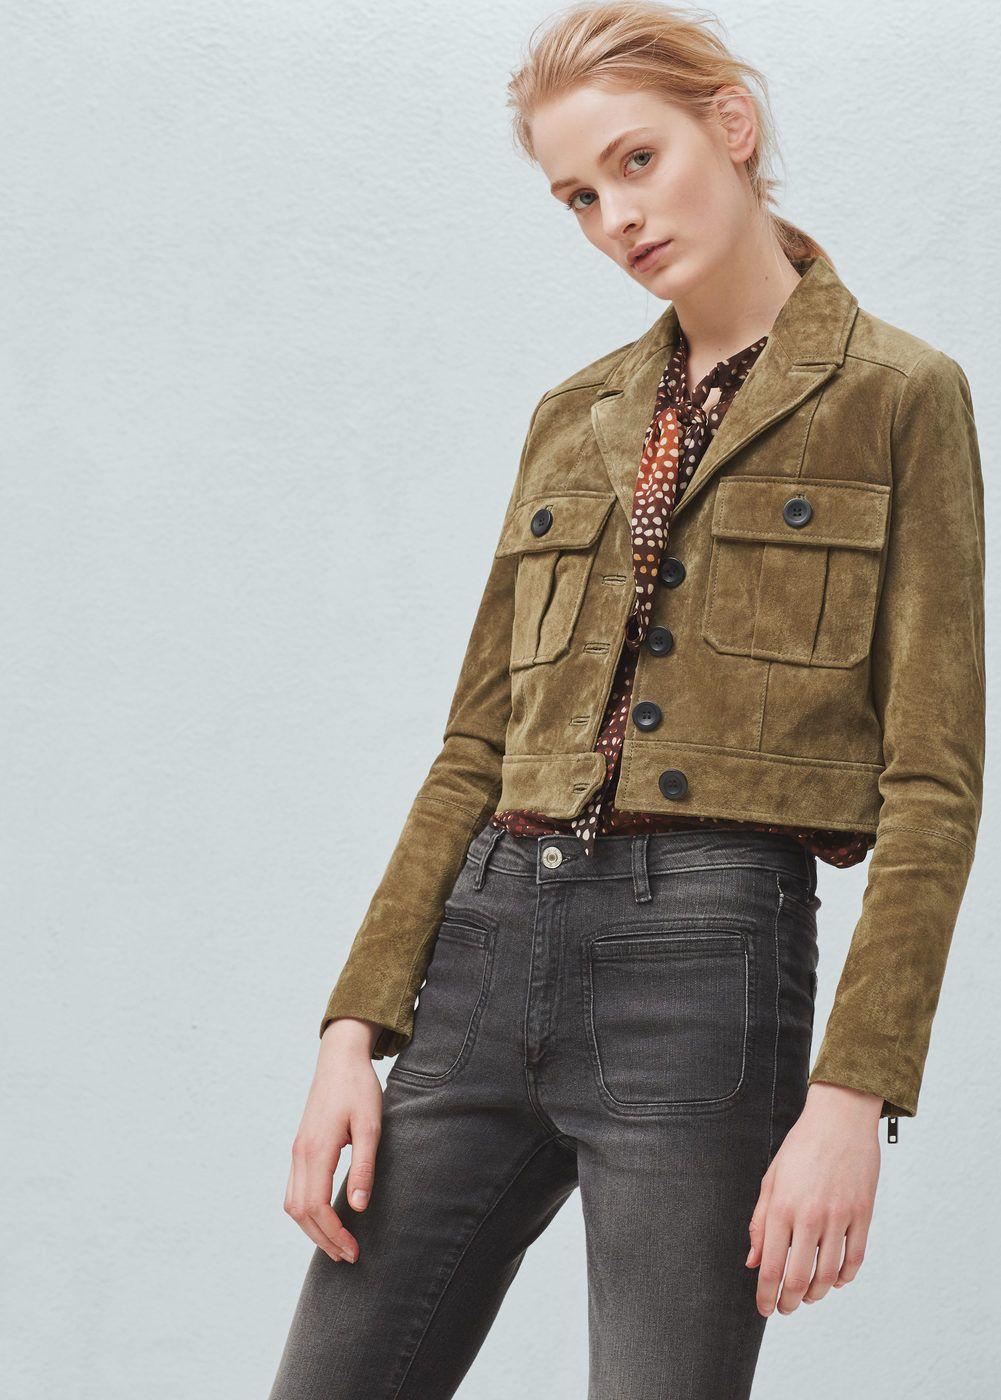 ef956893f23 Suede jacket - Jackets for Women